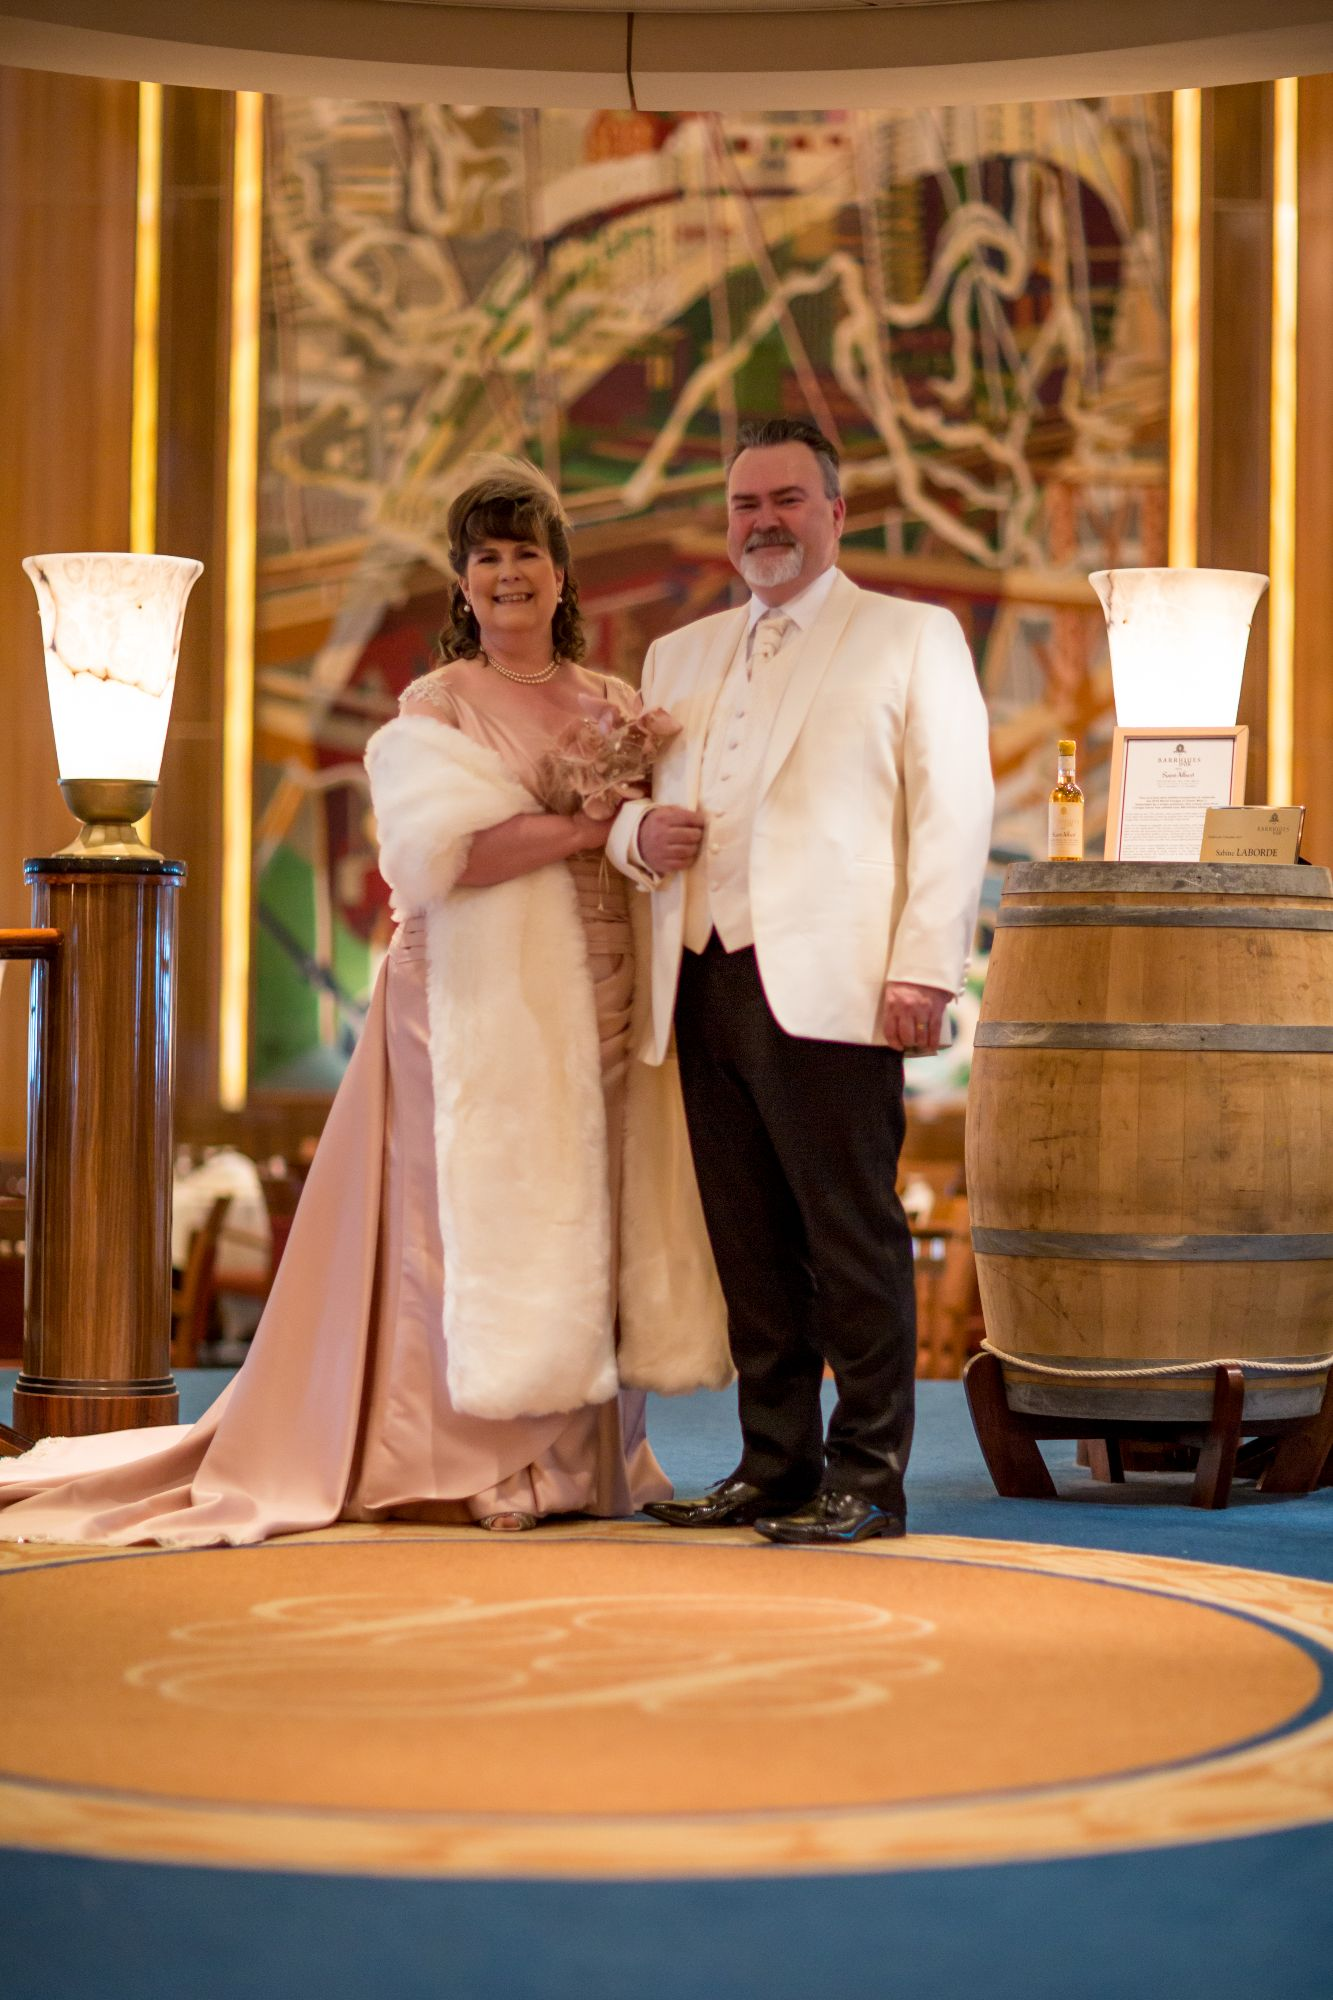 Cruise 1930s wedding dress